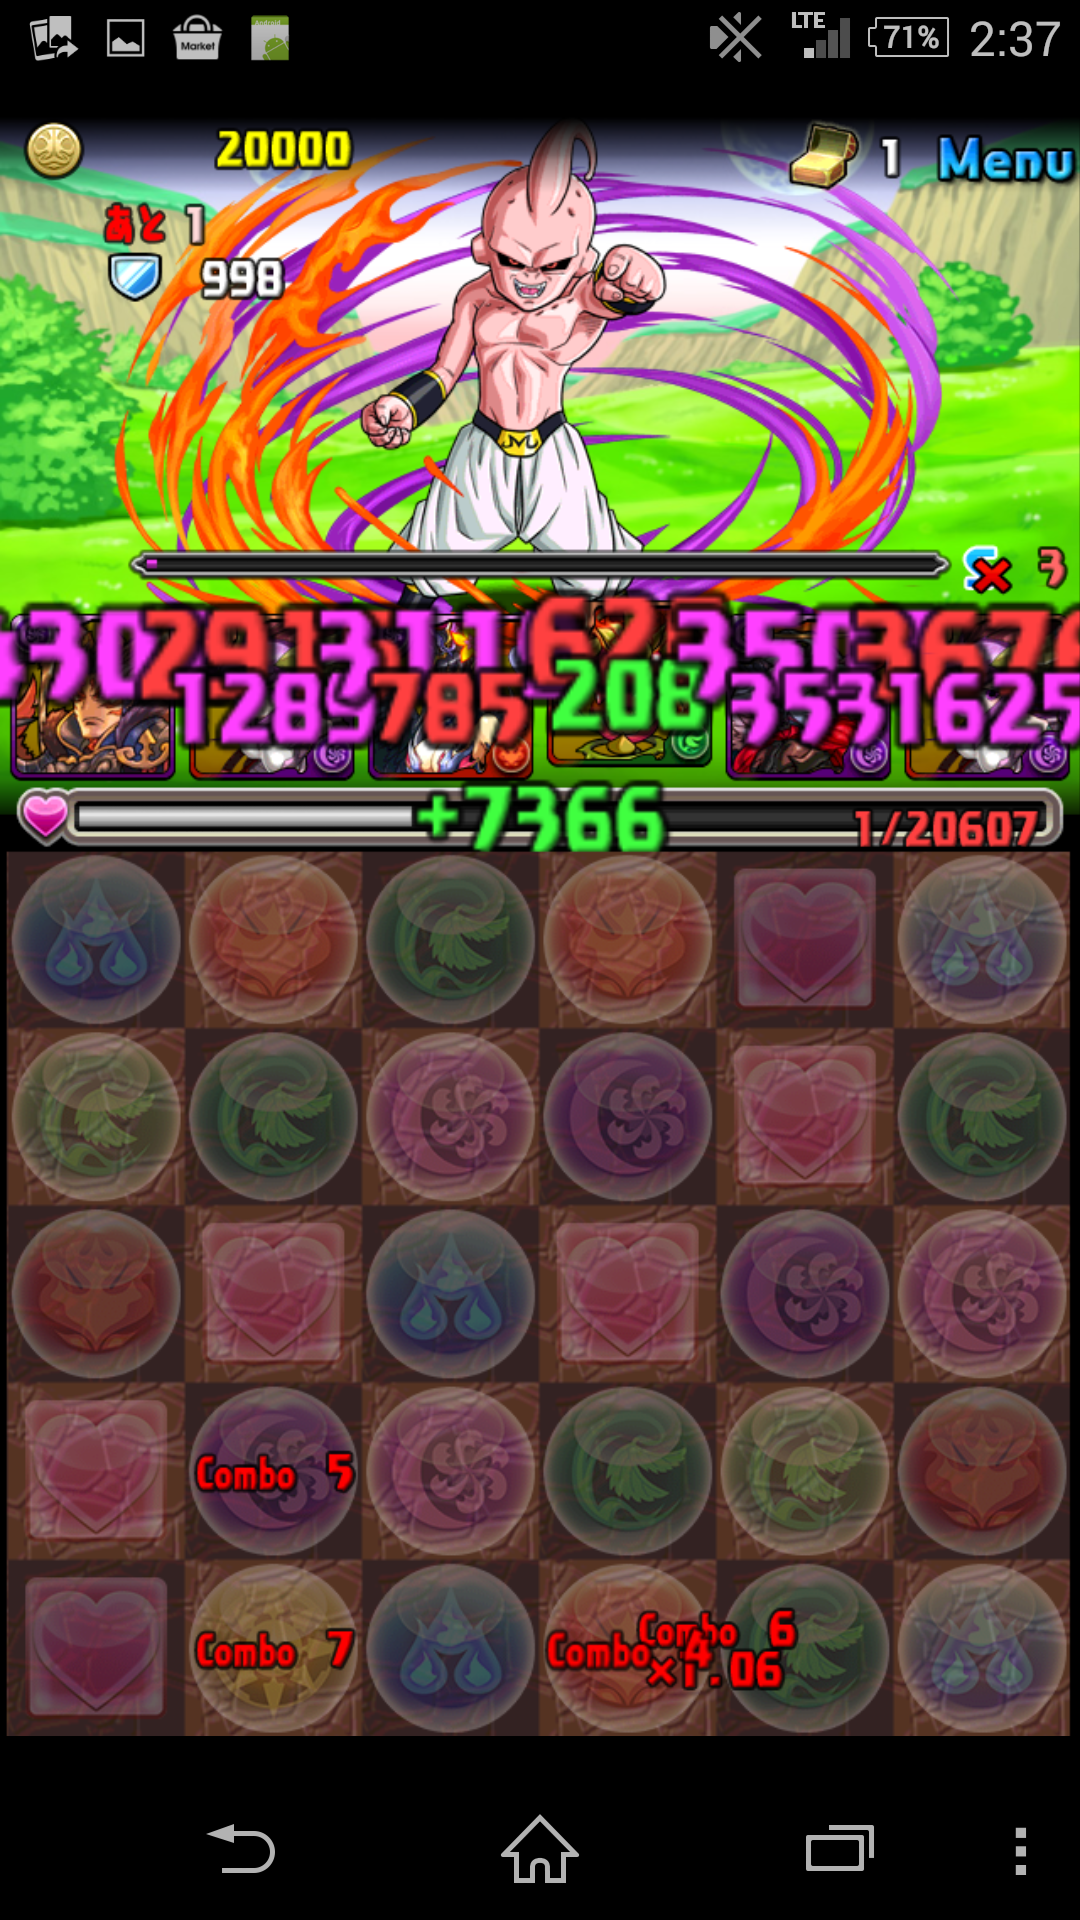 Screenshot_2014-09-26-02-37-09.png